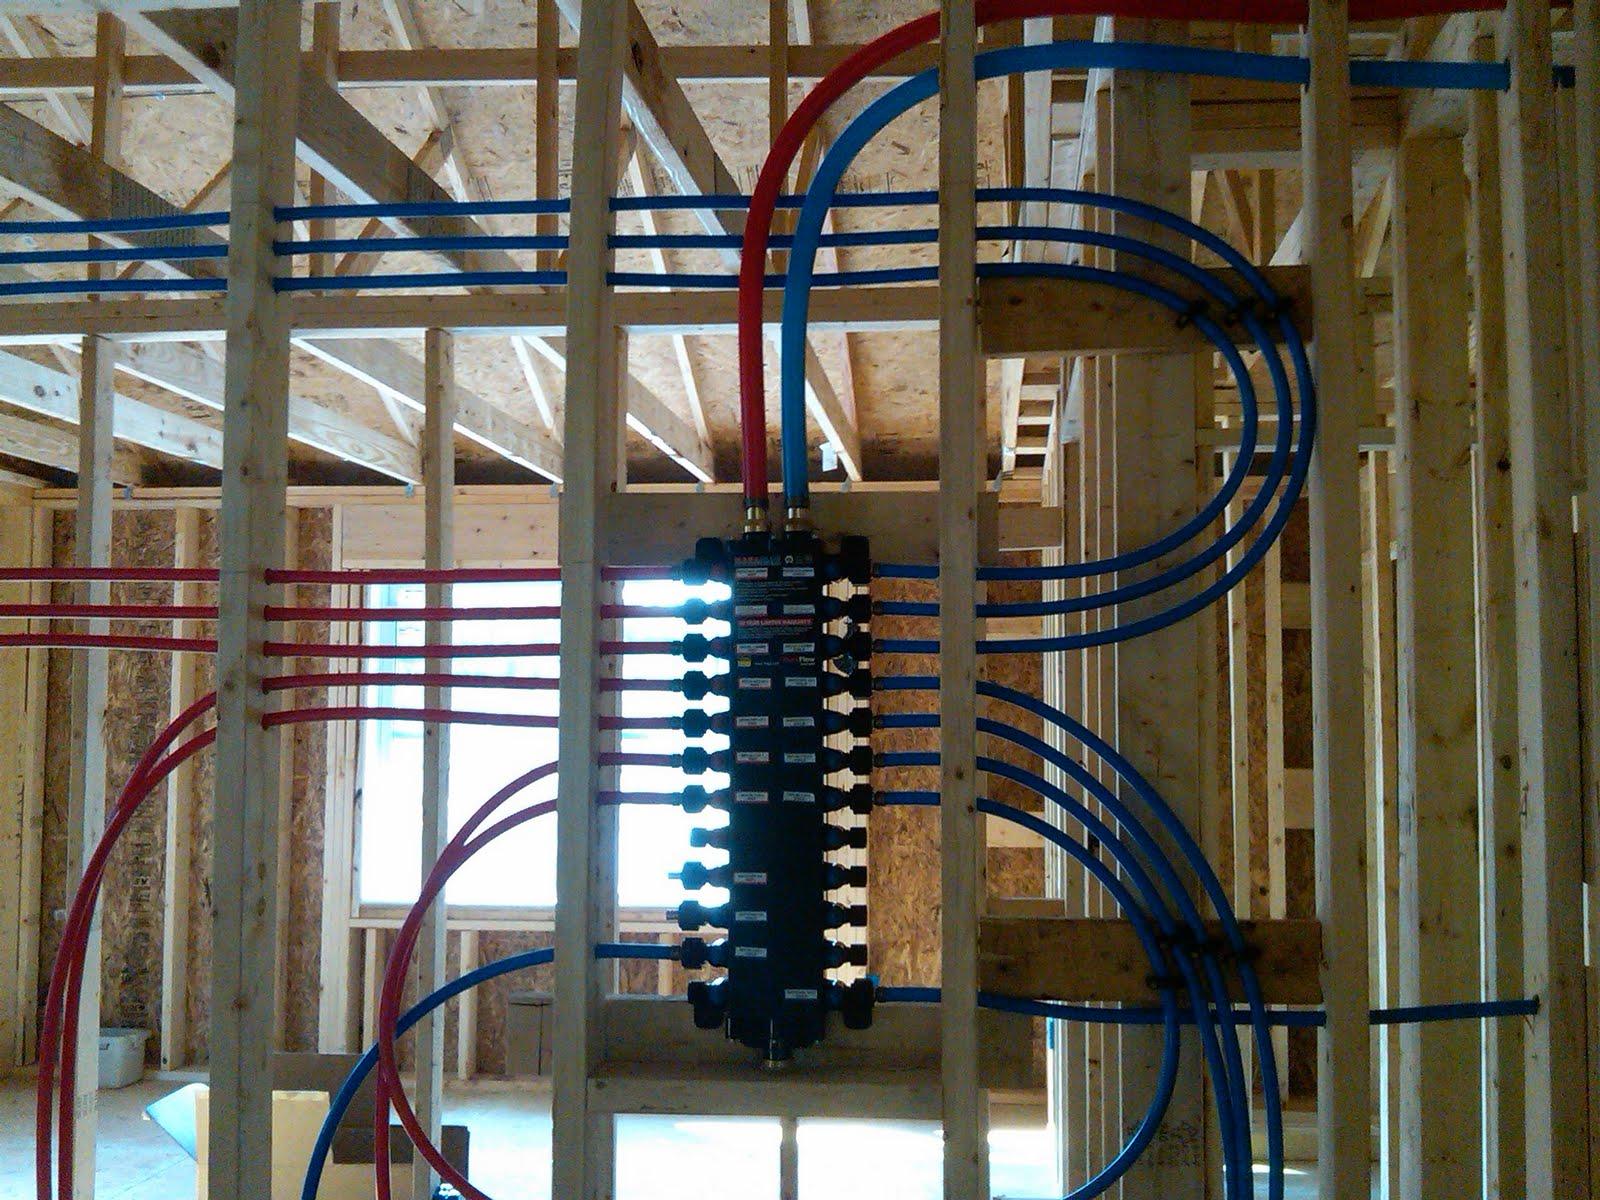 plumbing manifold diagram 1991 honda civic hatchback radio wiring not quite a teardown progress pex bathroom